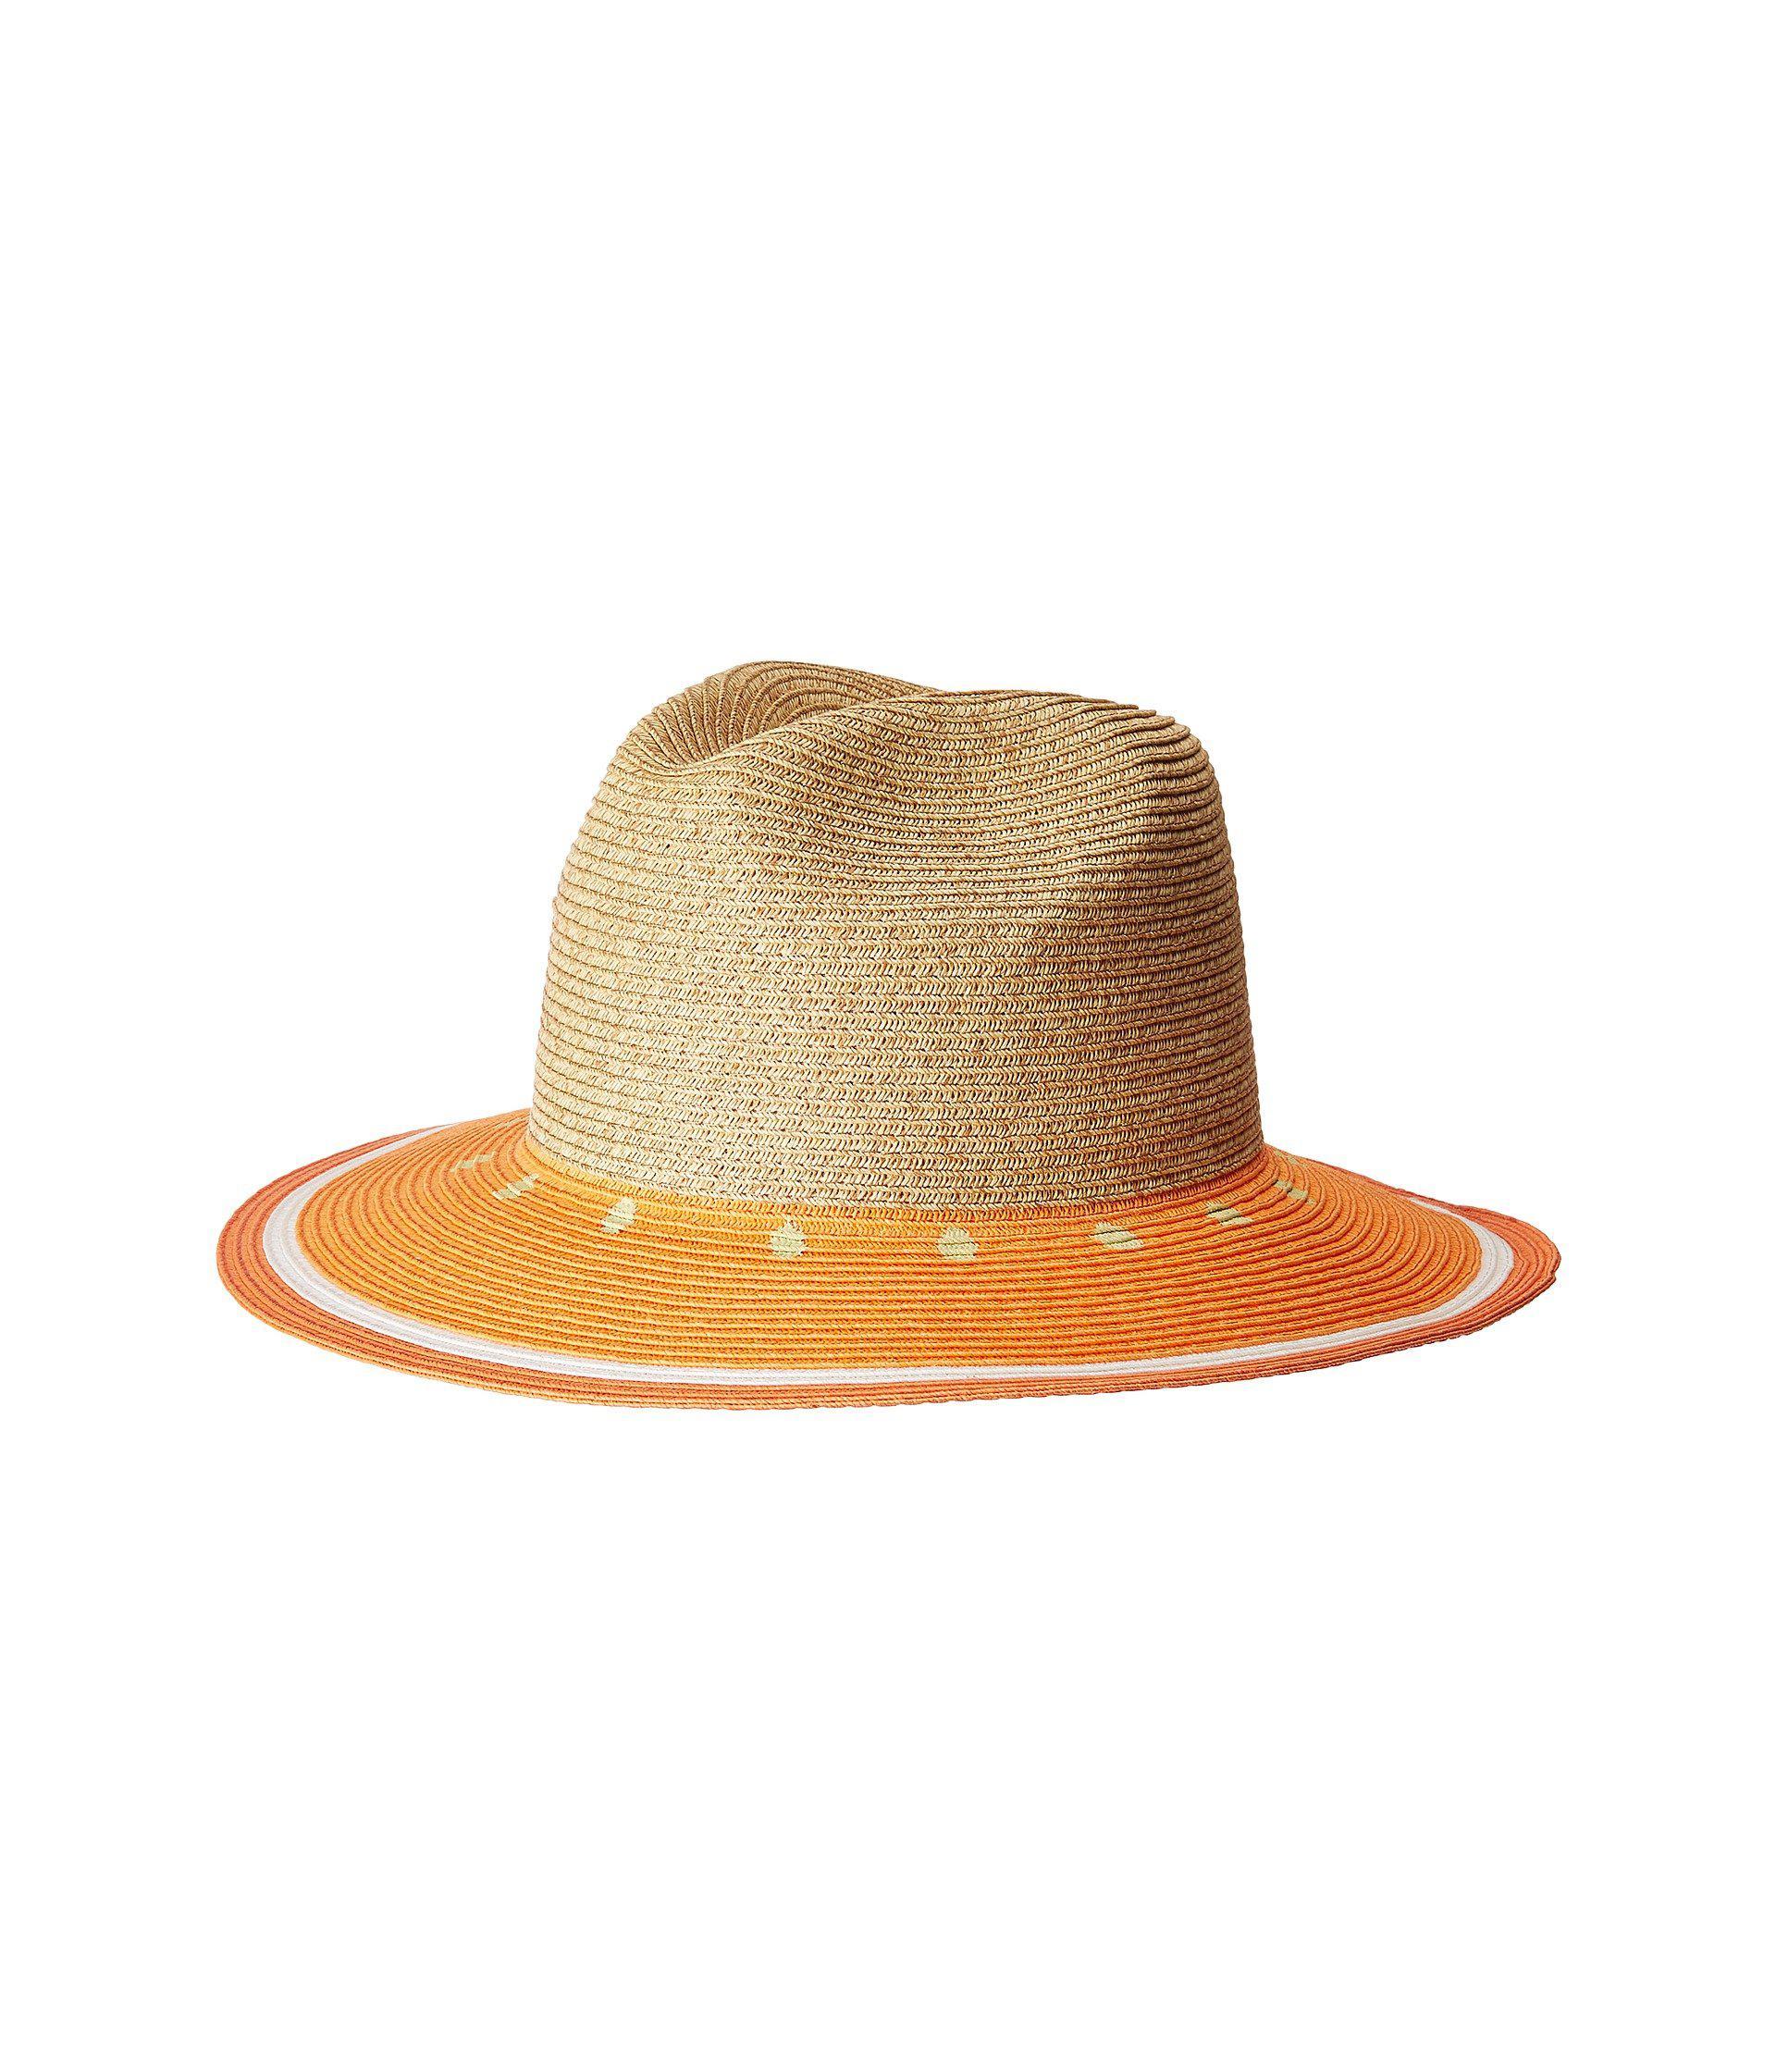 Lyst - San Diego Hat Company Ubf1102 Fruit Fedora in Orange e3d50feb3202